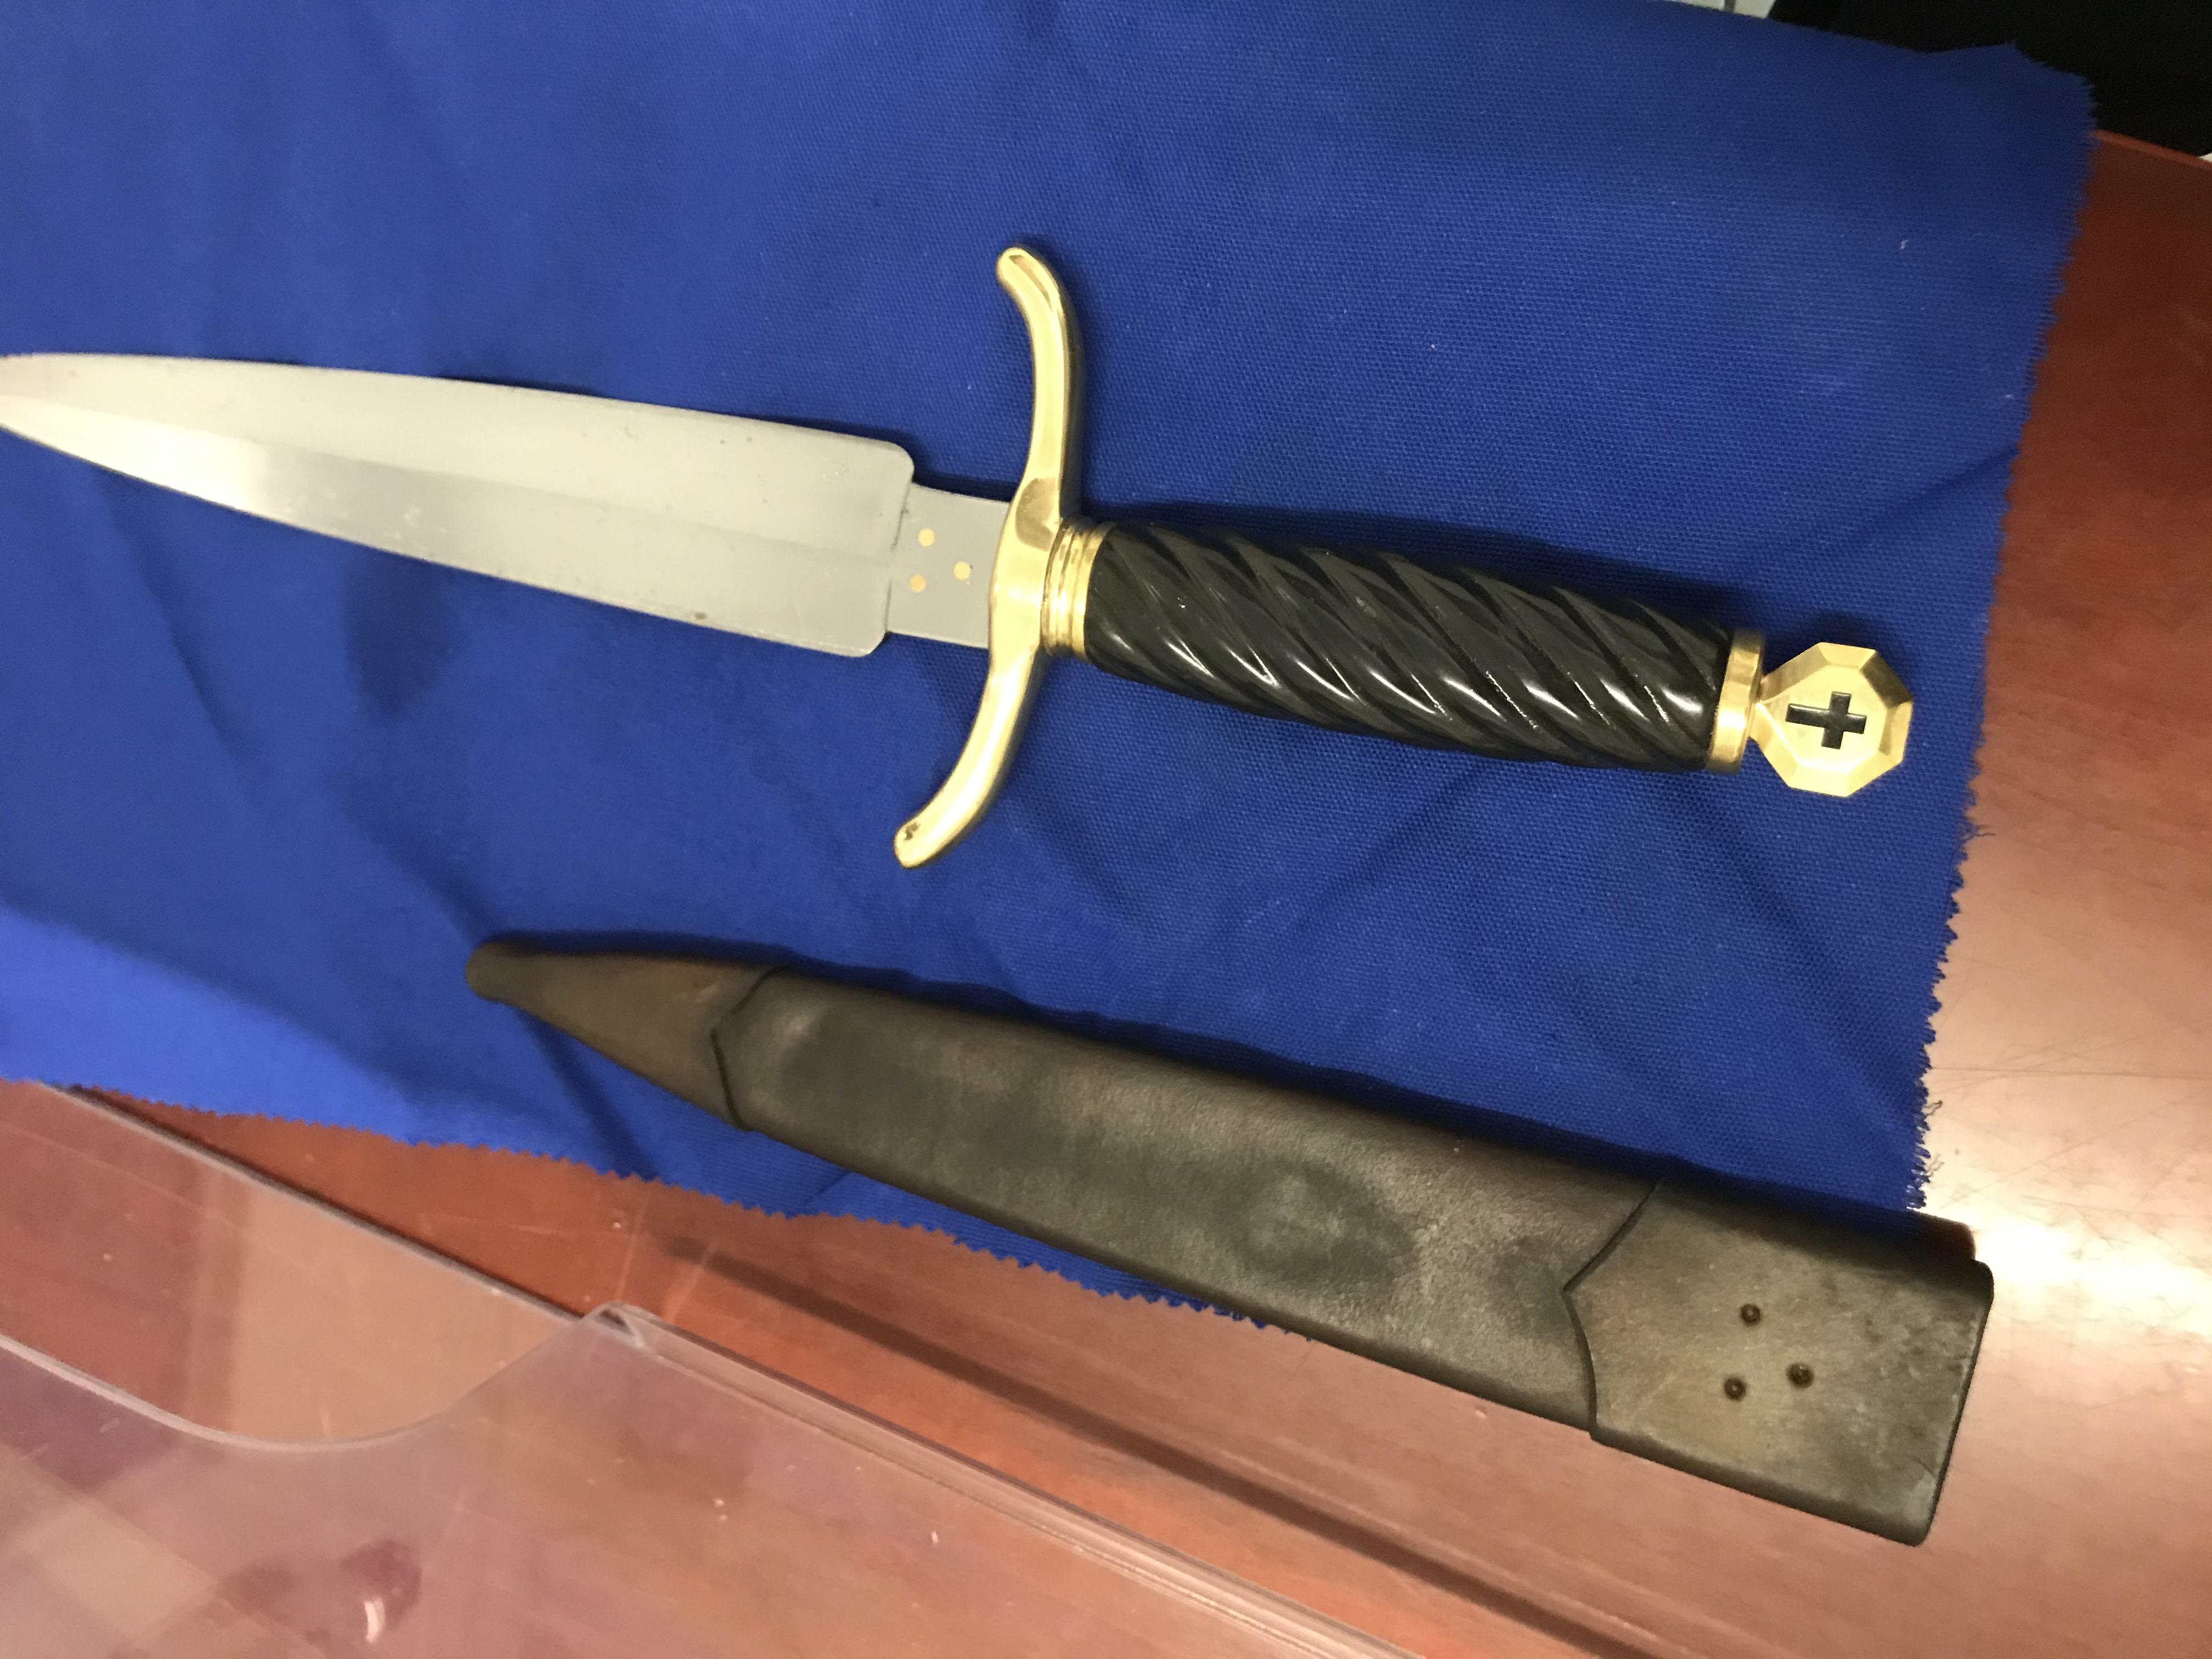 IMG_2937.jpg Templer Knights knife.jpg